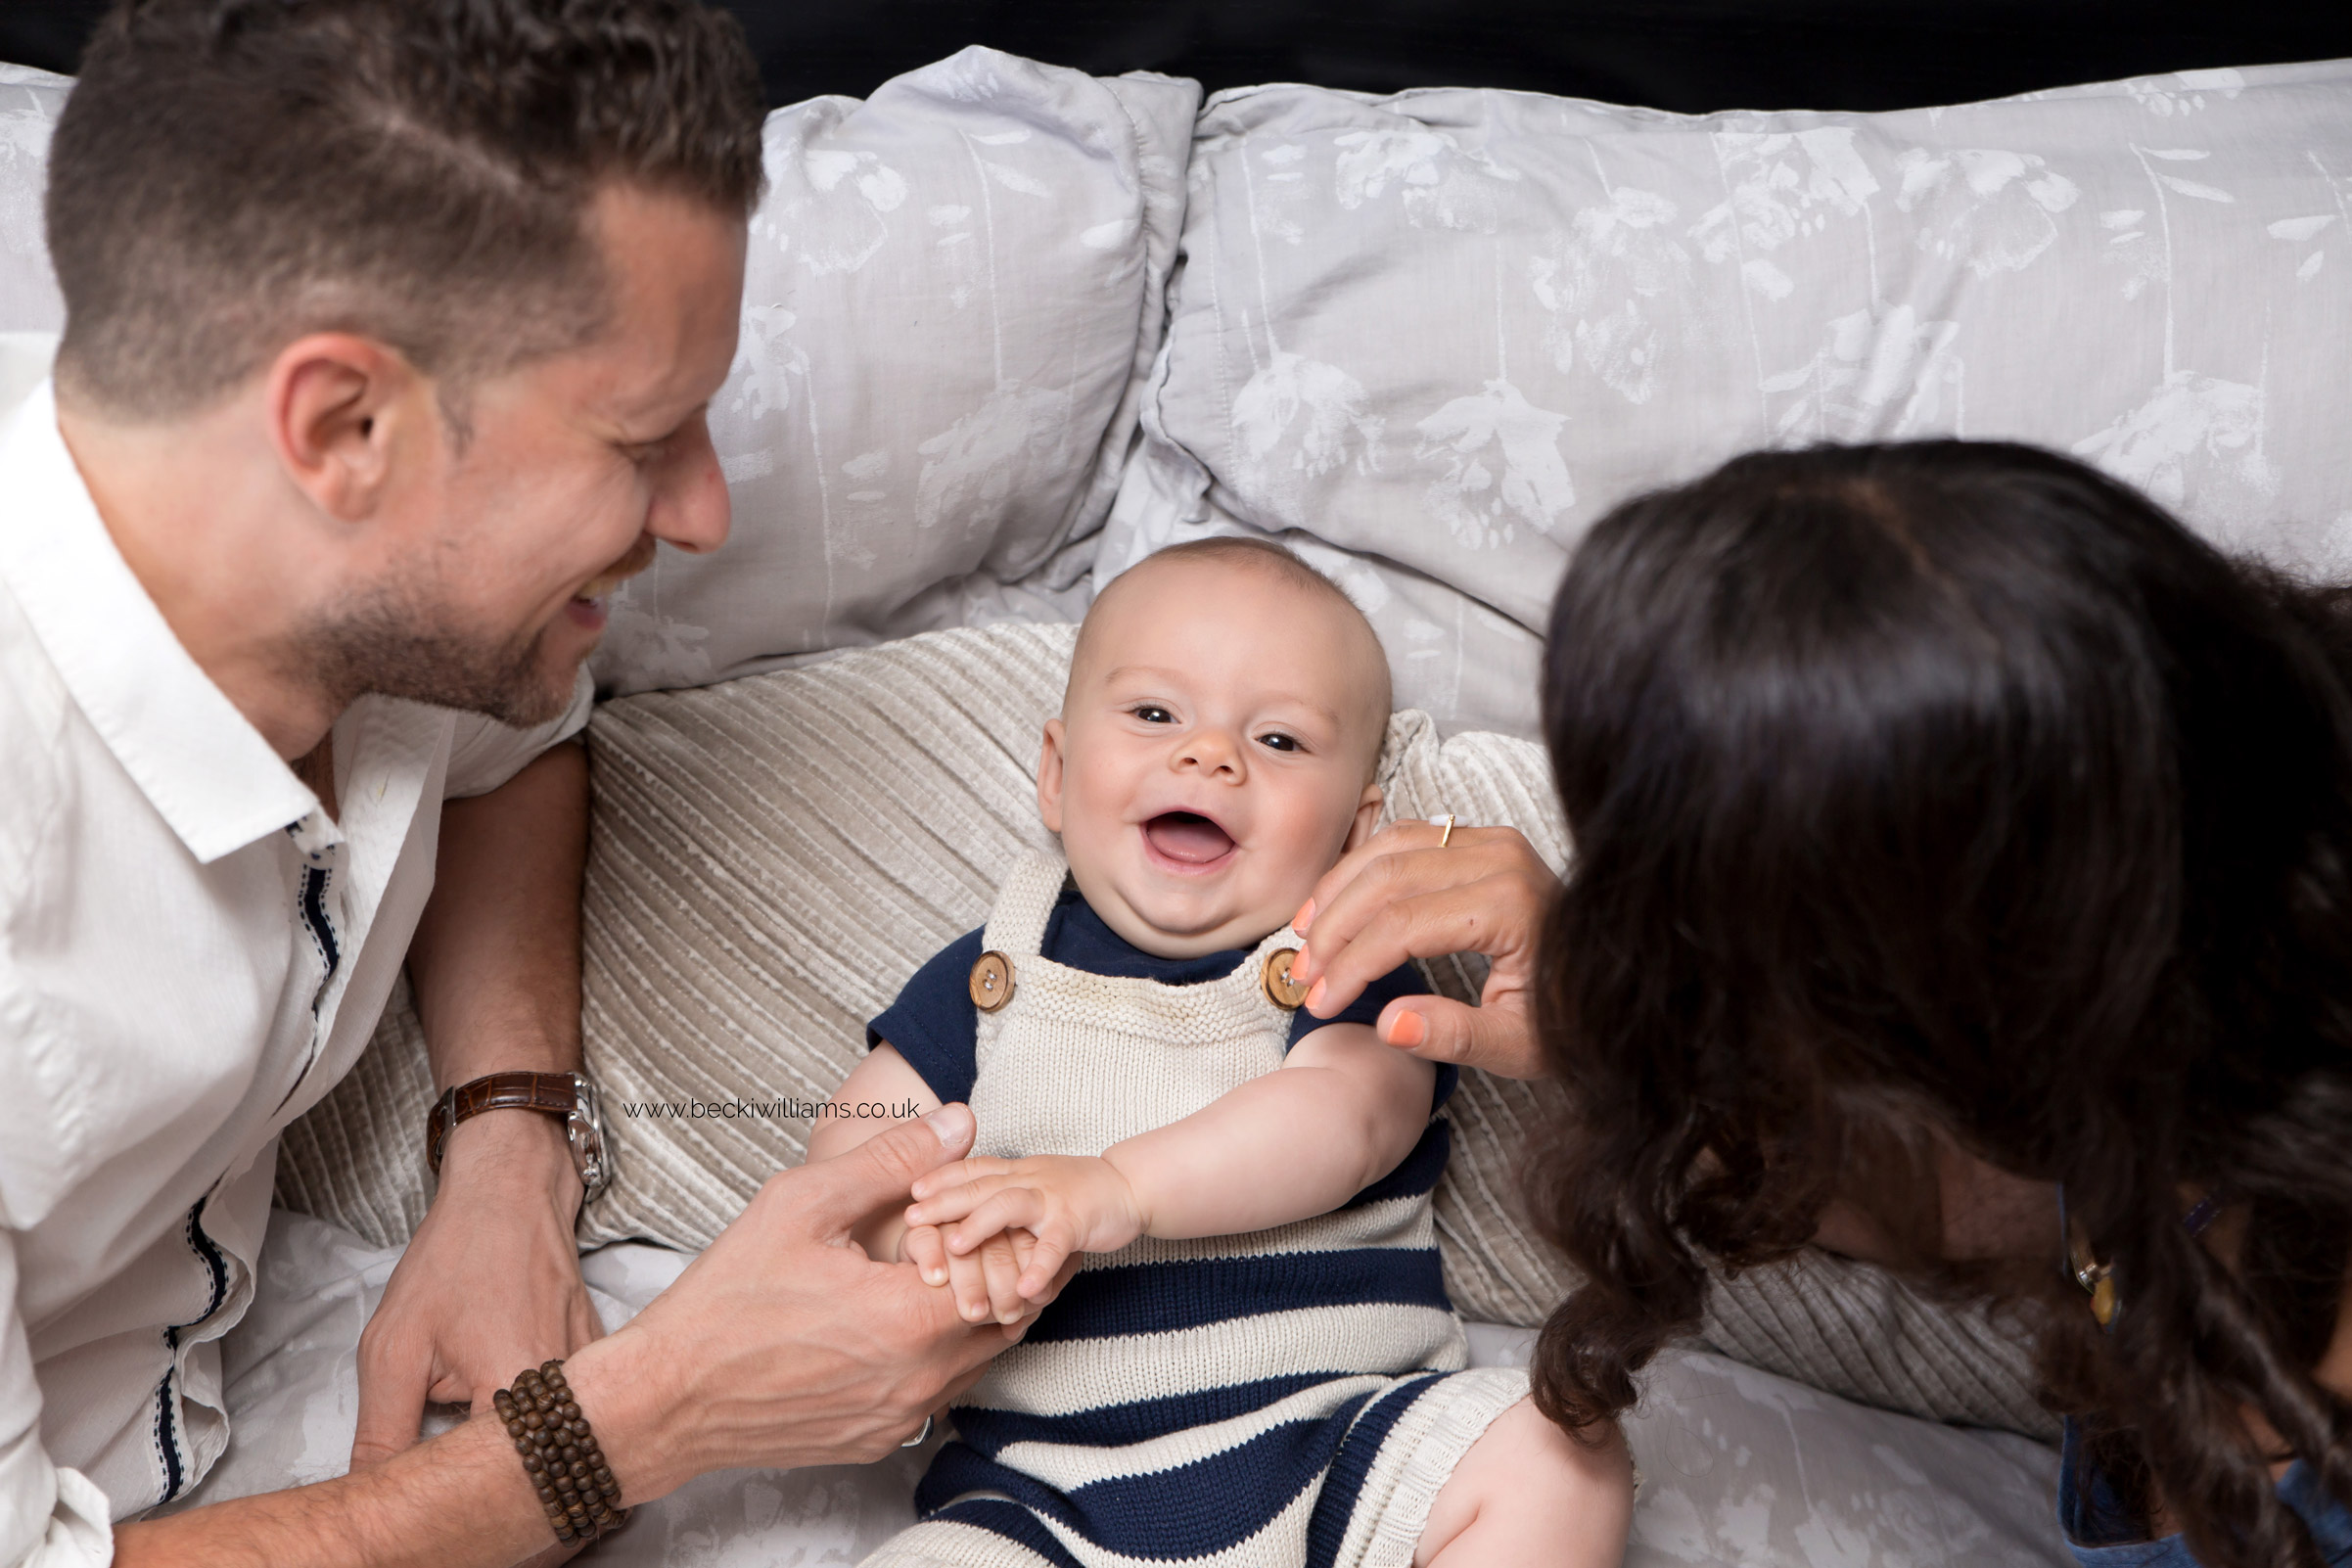 newborn-photographer-edgware-baby-bed-family-at-home.jpg